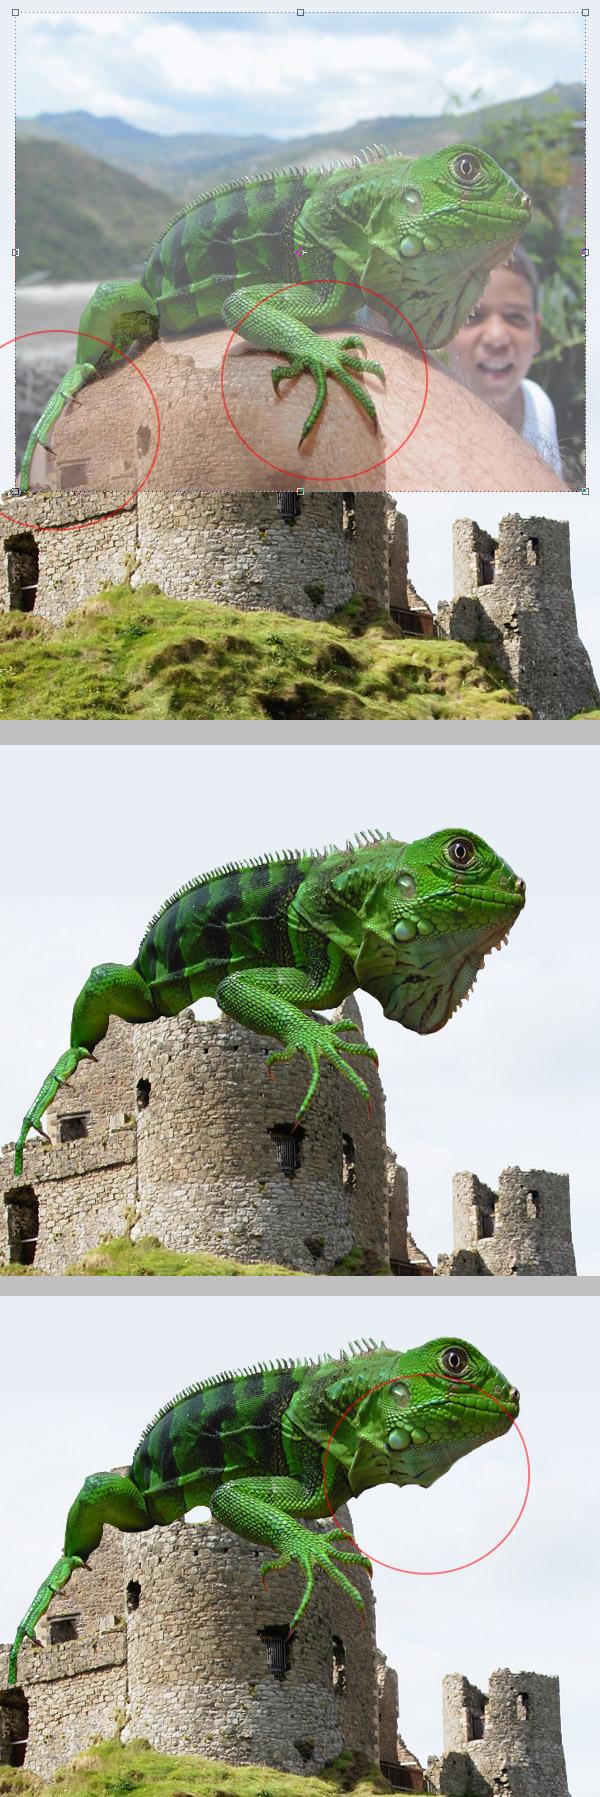 Photoshop图像合成实例:栩栩如生的翼龙_亿码酷站___亿码酷站平面设计教程插图3